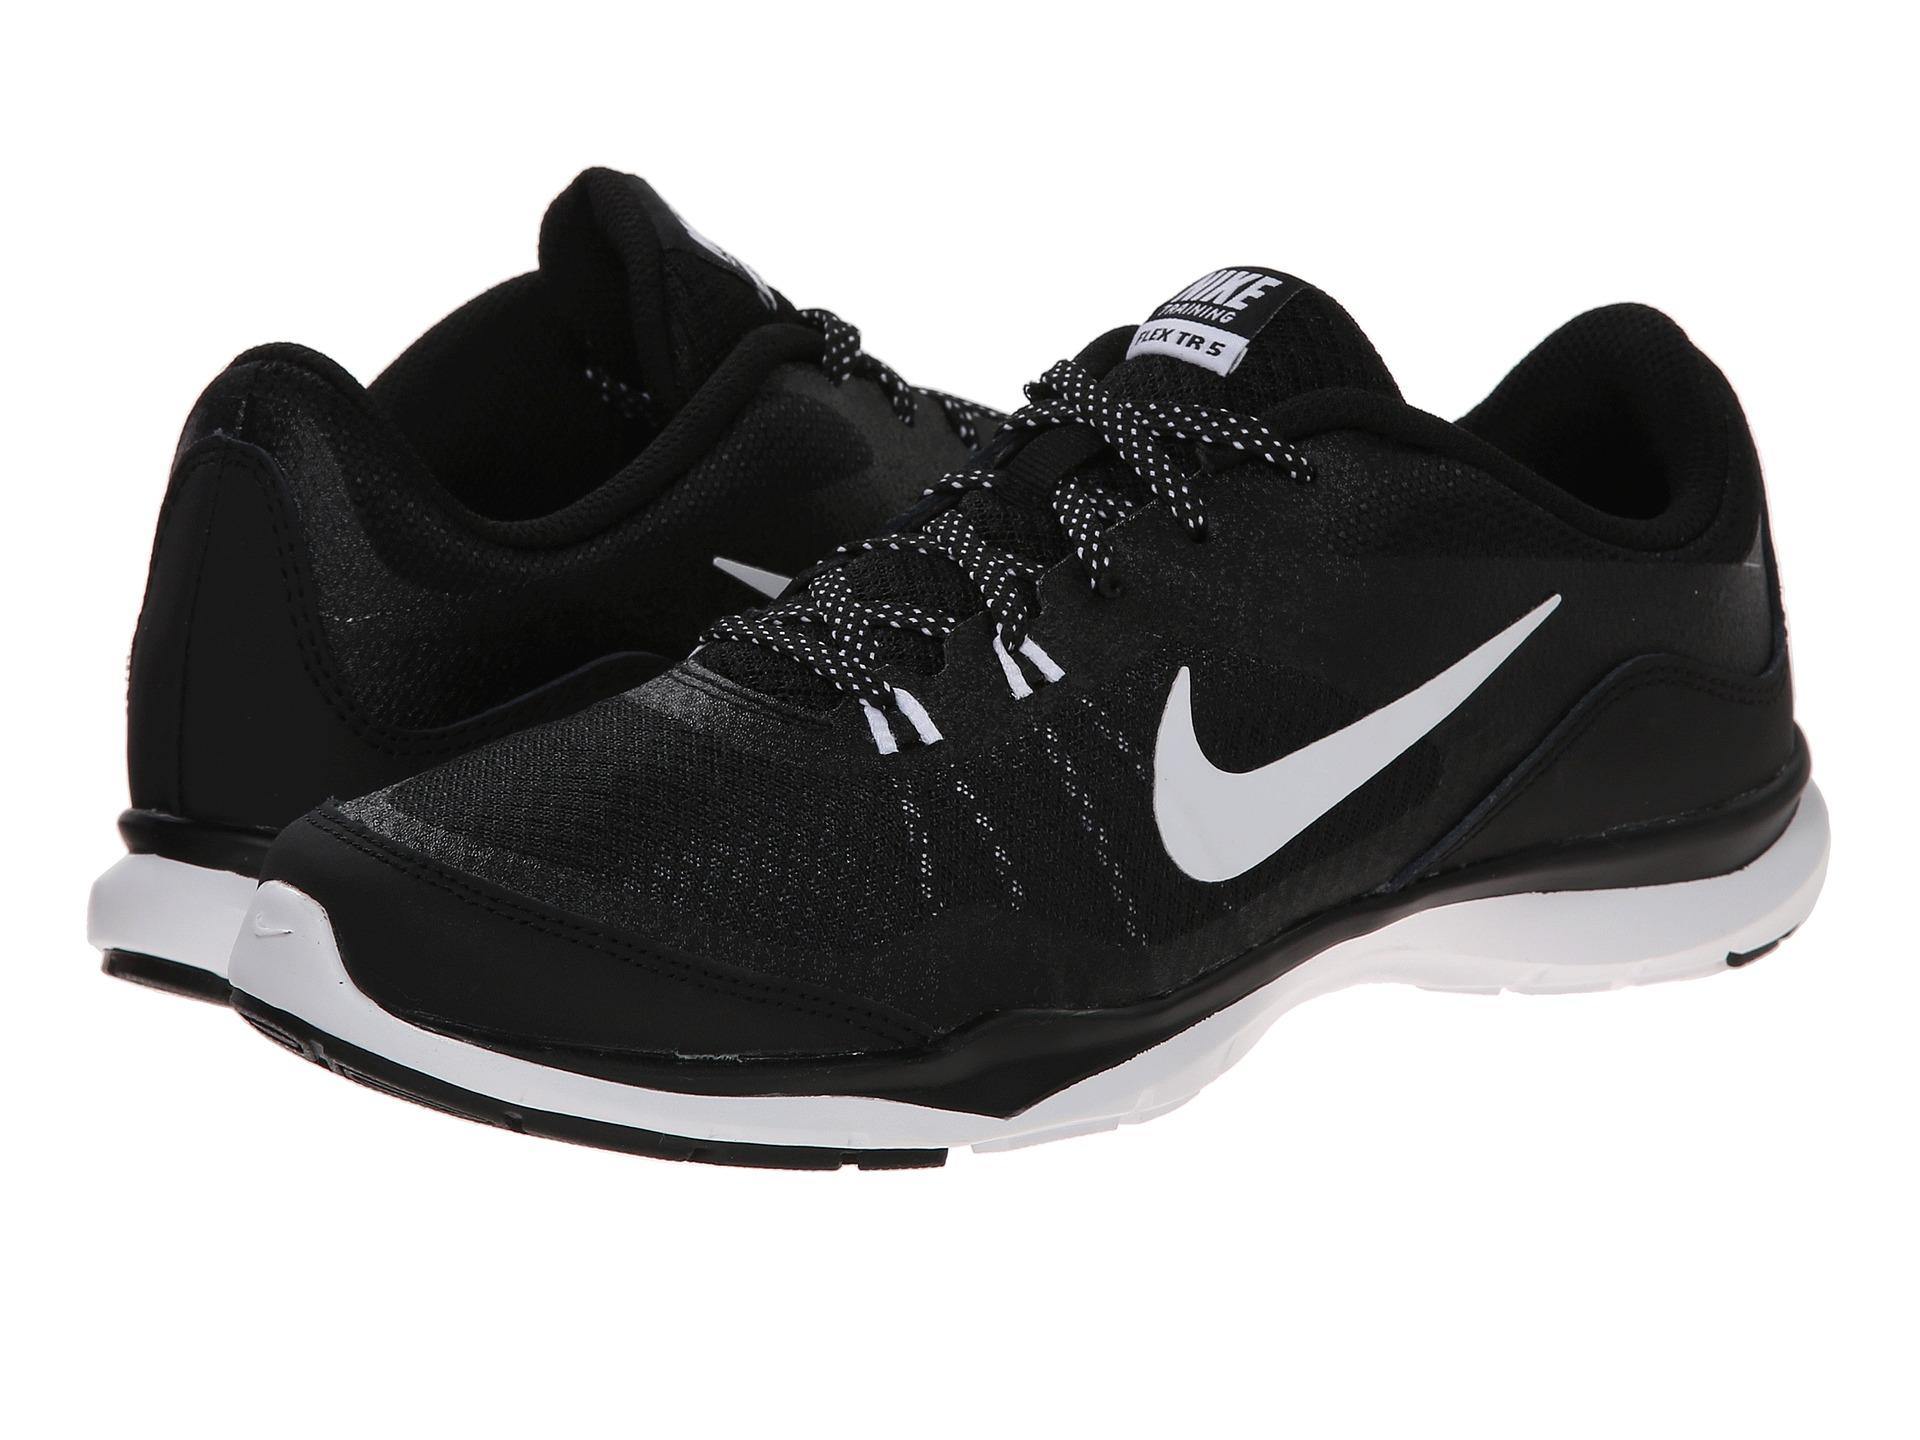 Nike Core Flex Training Shoes